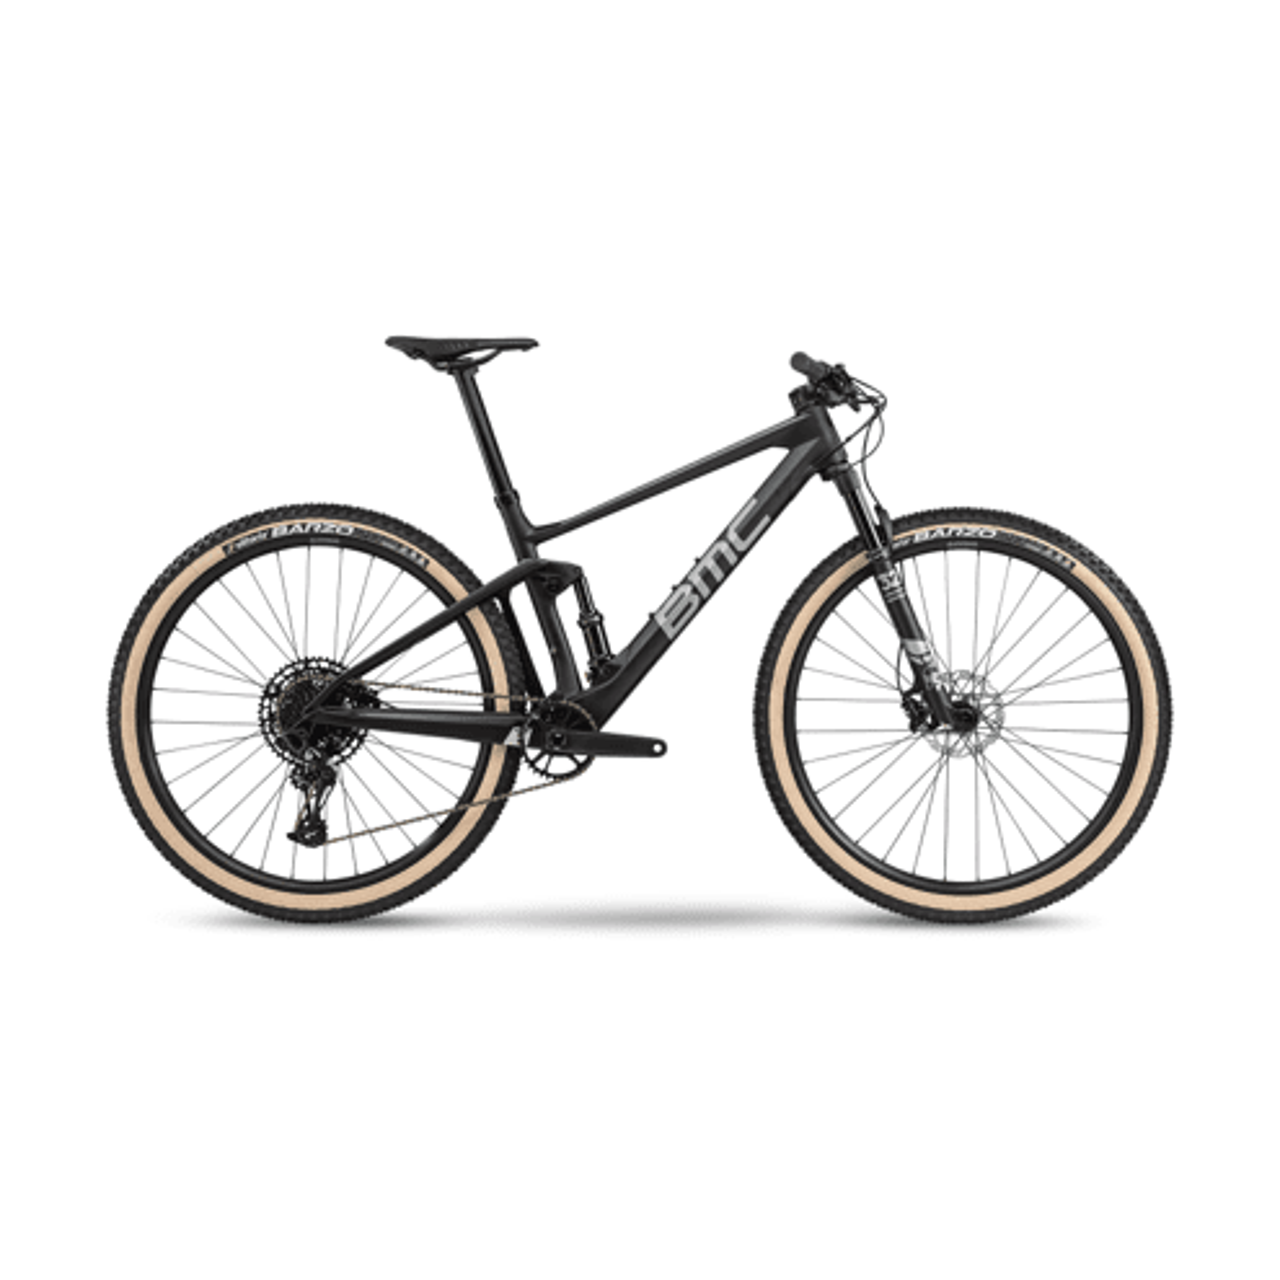 BICICLETA 29 BMC FOURSTROKE 01 THREE 2020 12V NX EAGLE